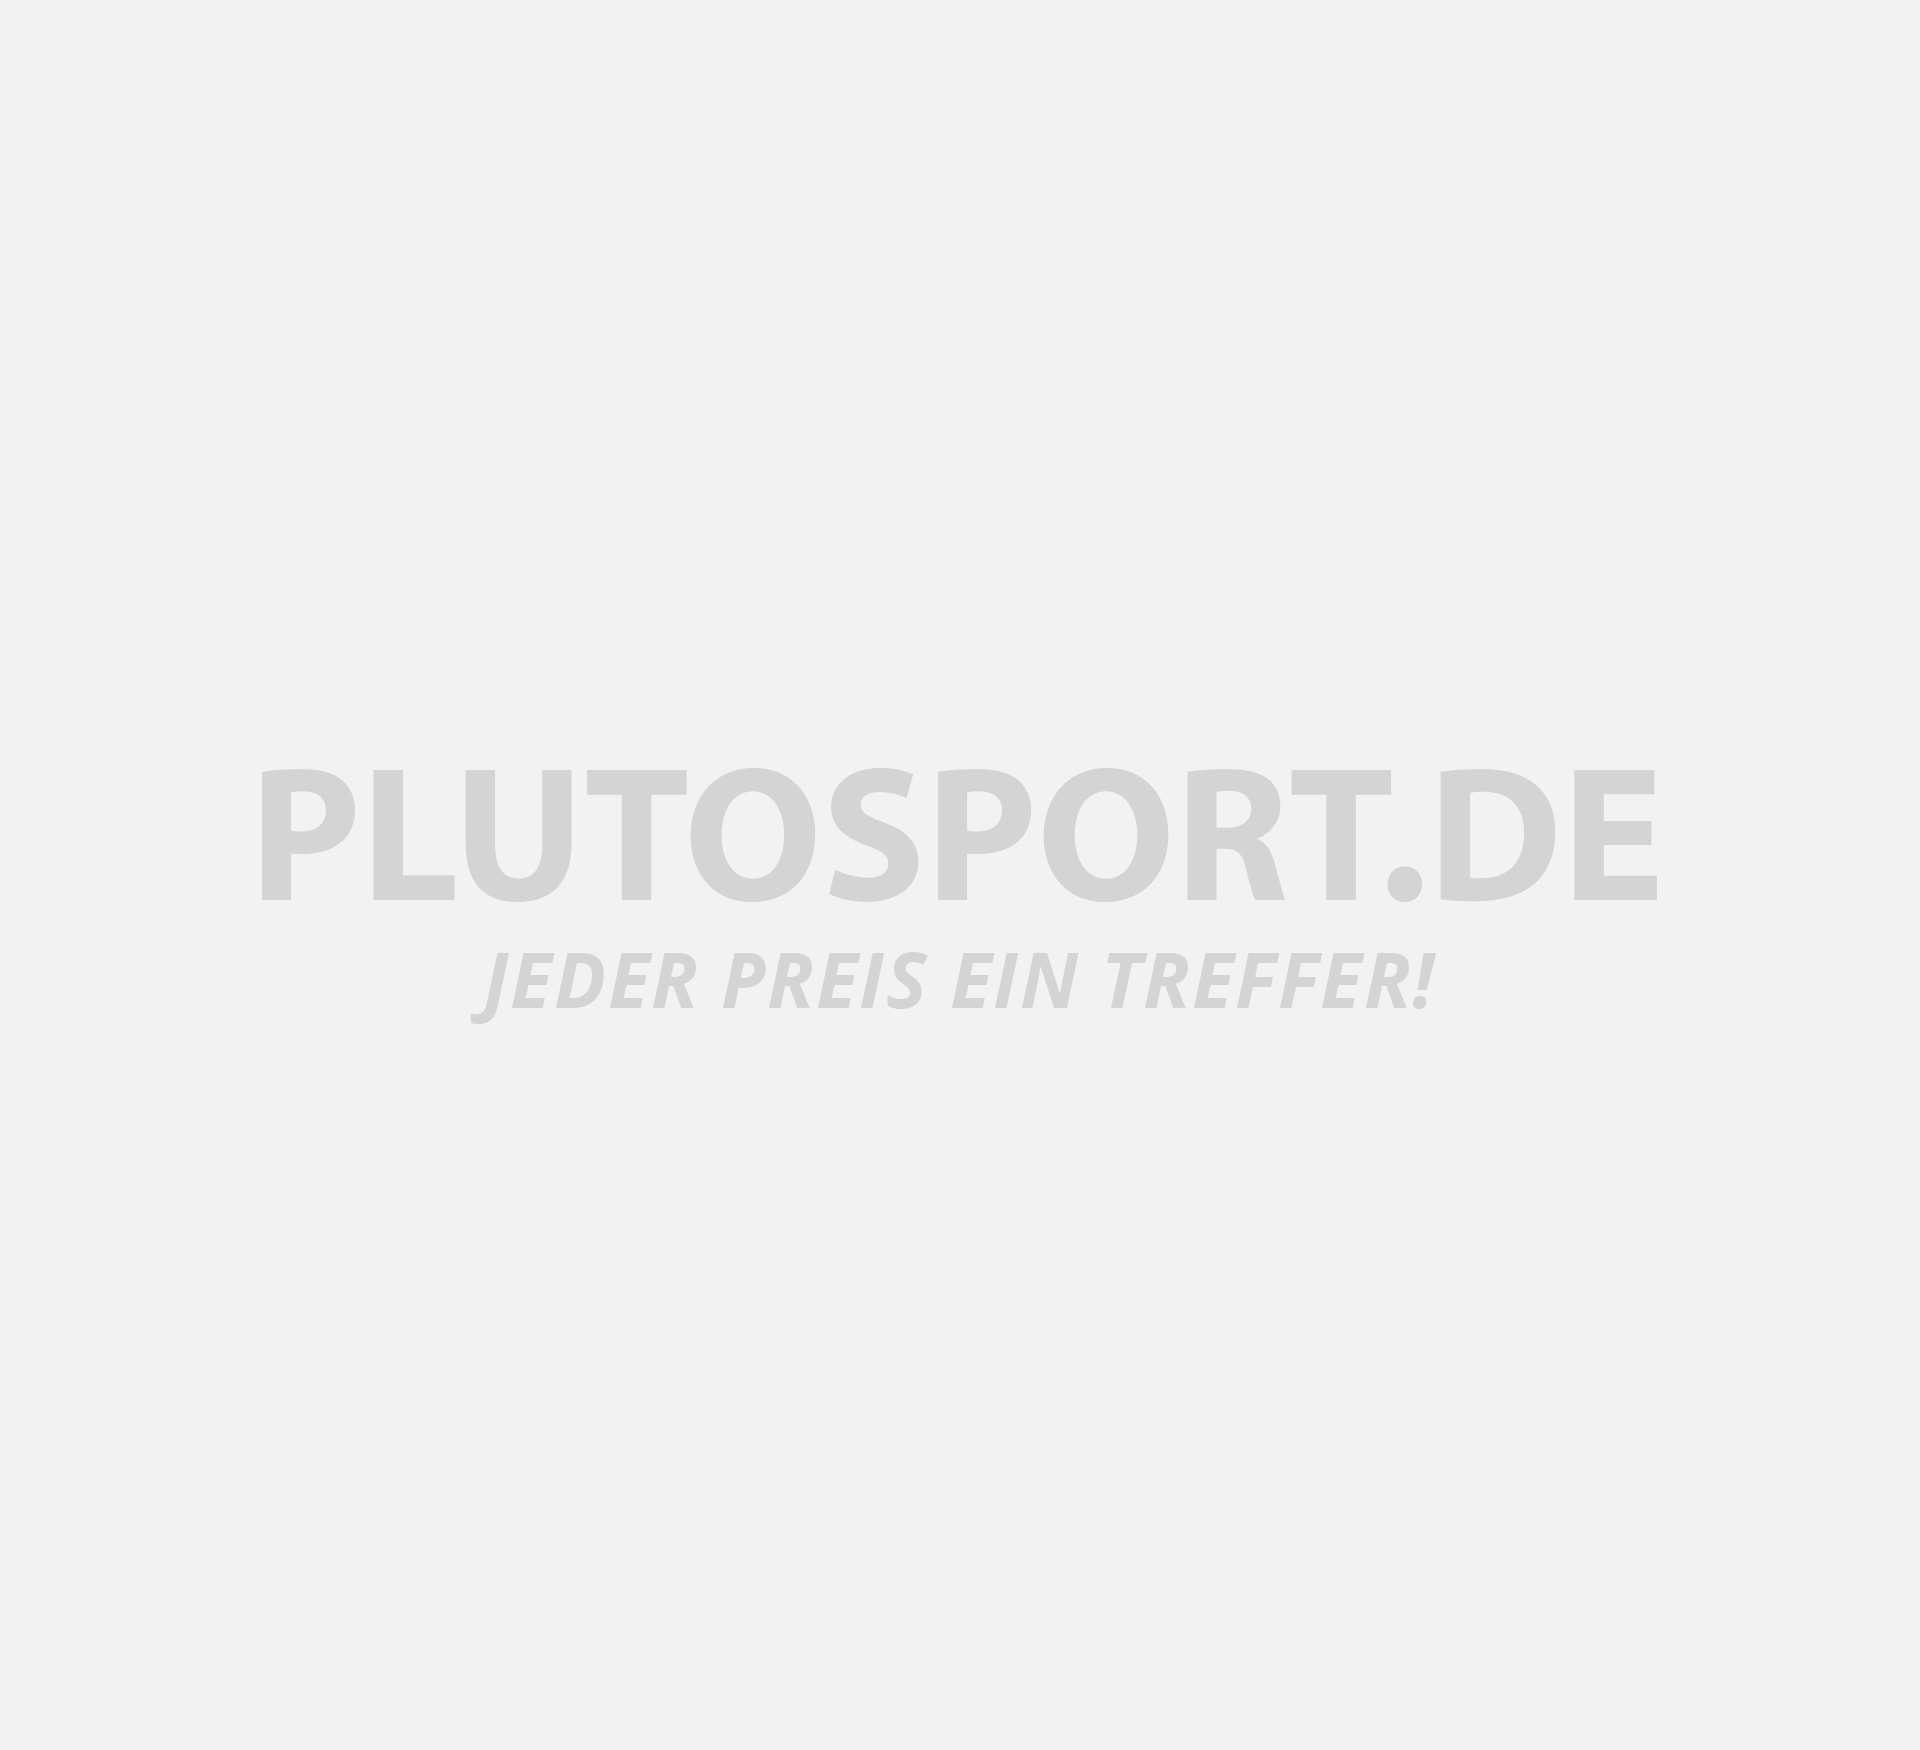 Uhlsport Hyperact Absolutegrip Finger Surround Torwarthandschuhe Senior